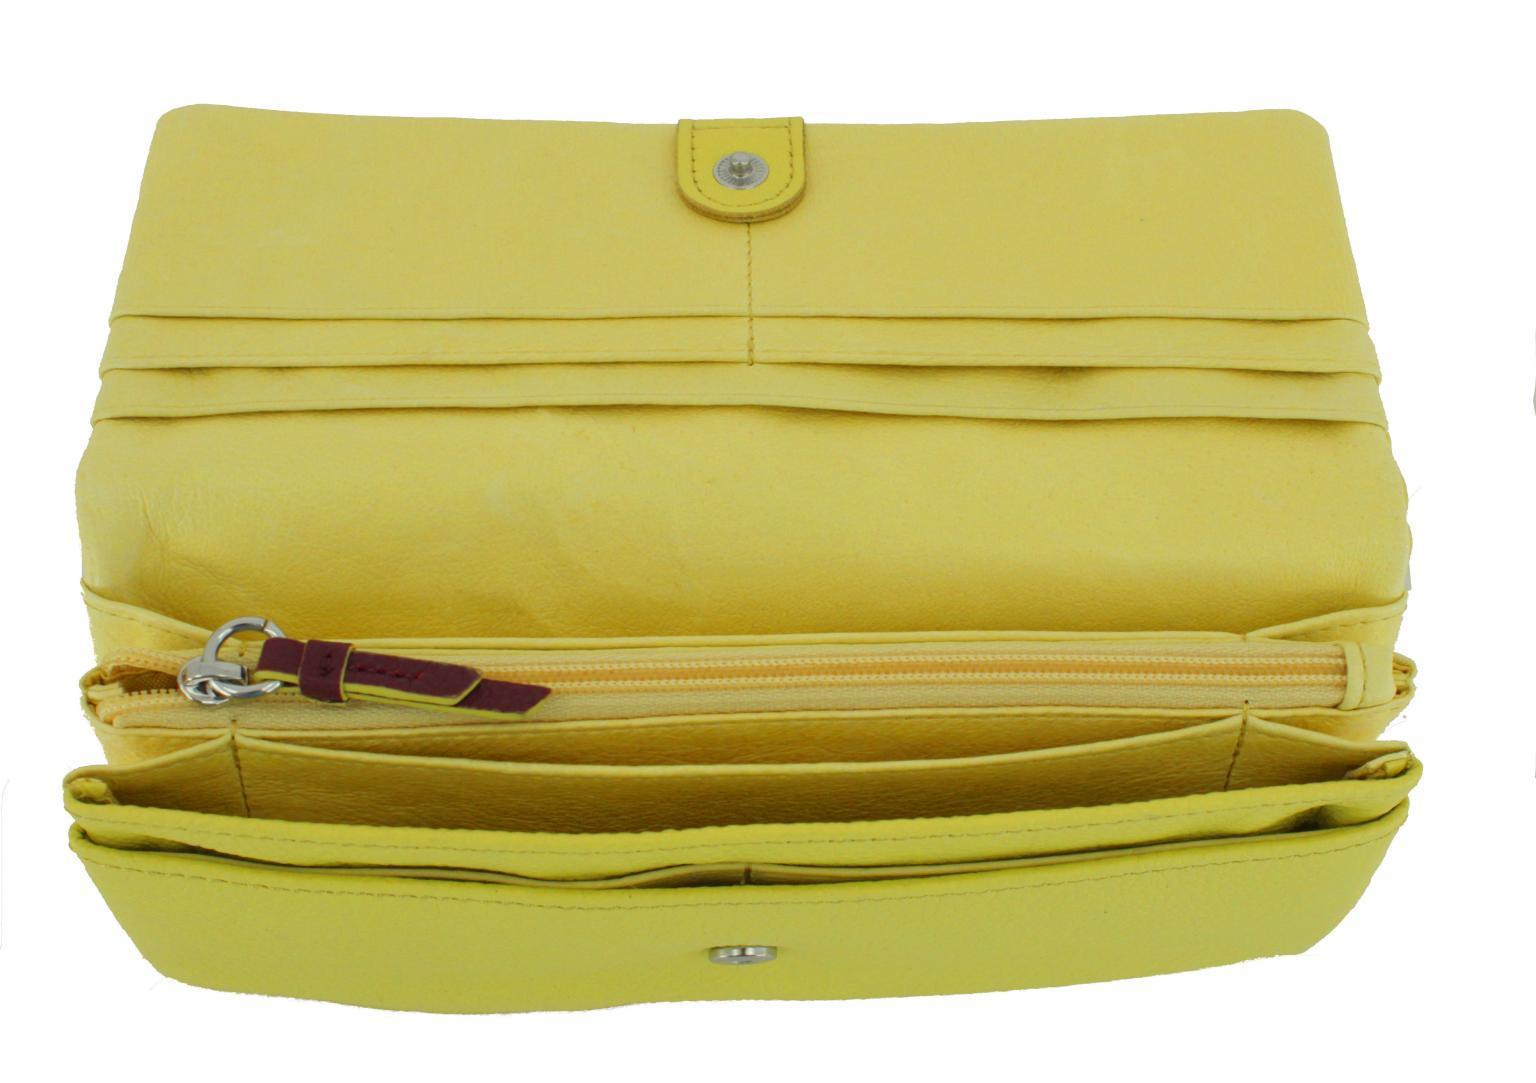 Liebeskind Geldtasche SlamLS8 Vintage sun gelb/lila